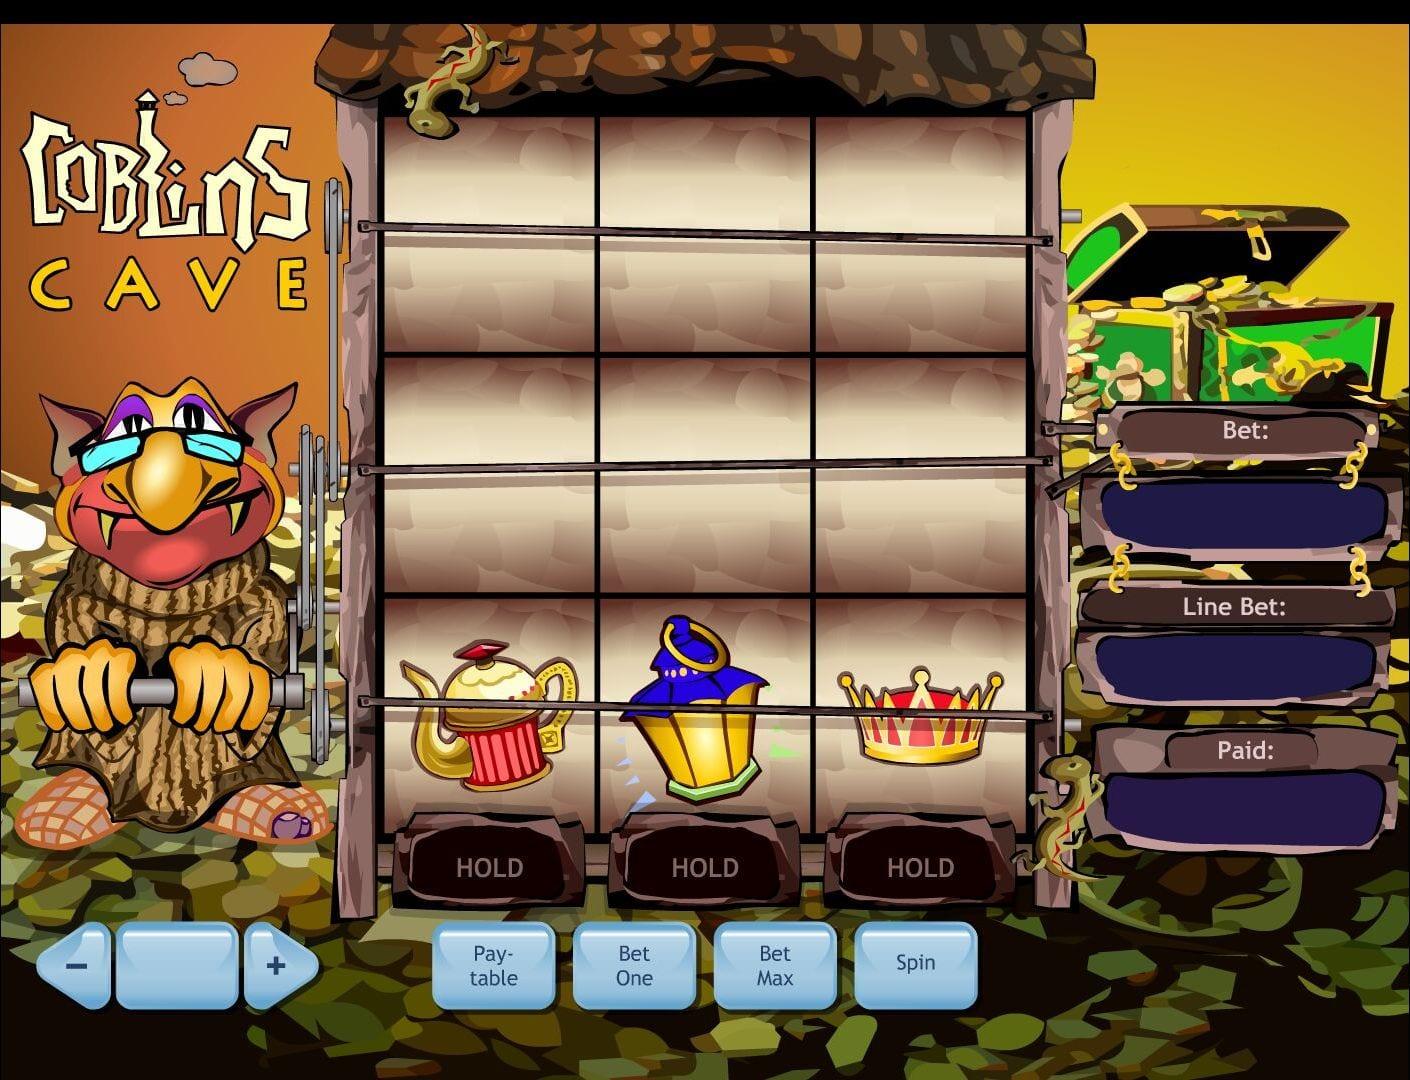 Slot Machine Goblins Cave Online Free